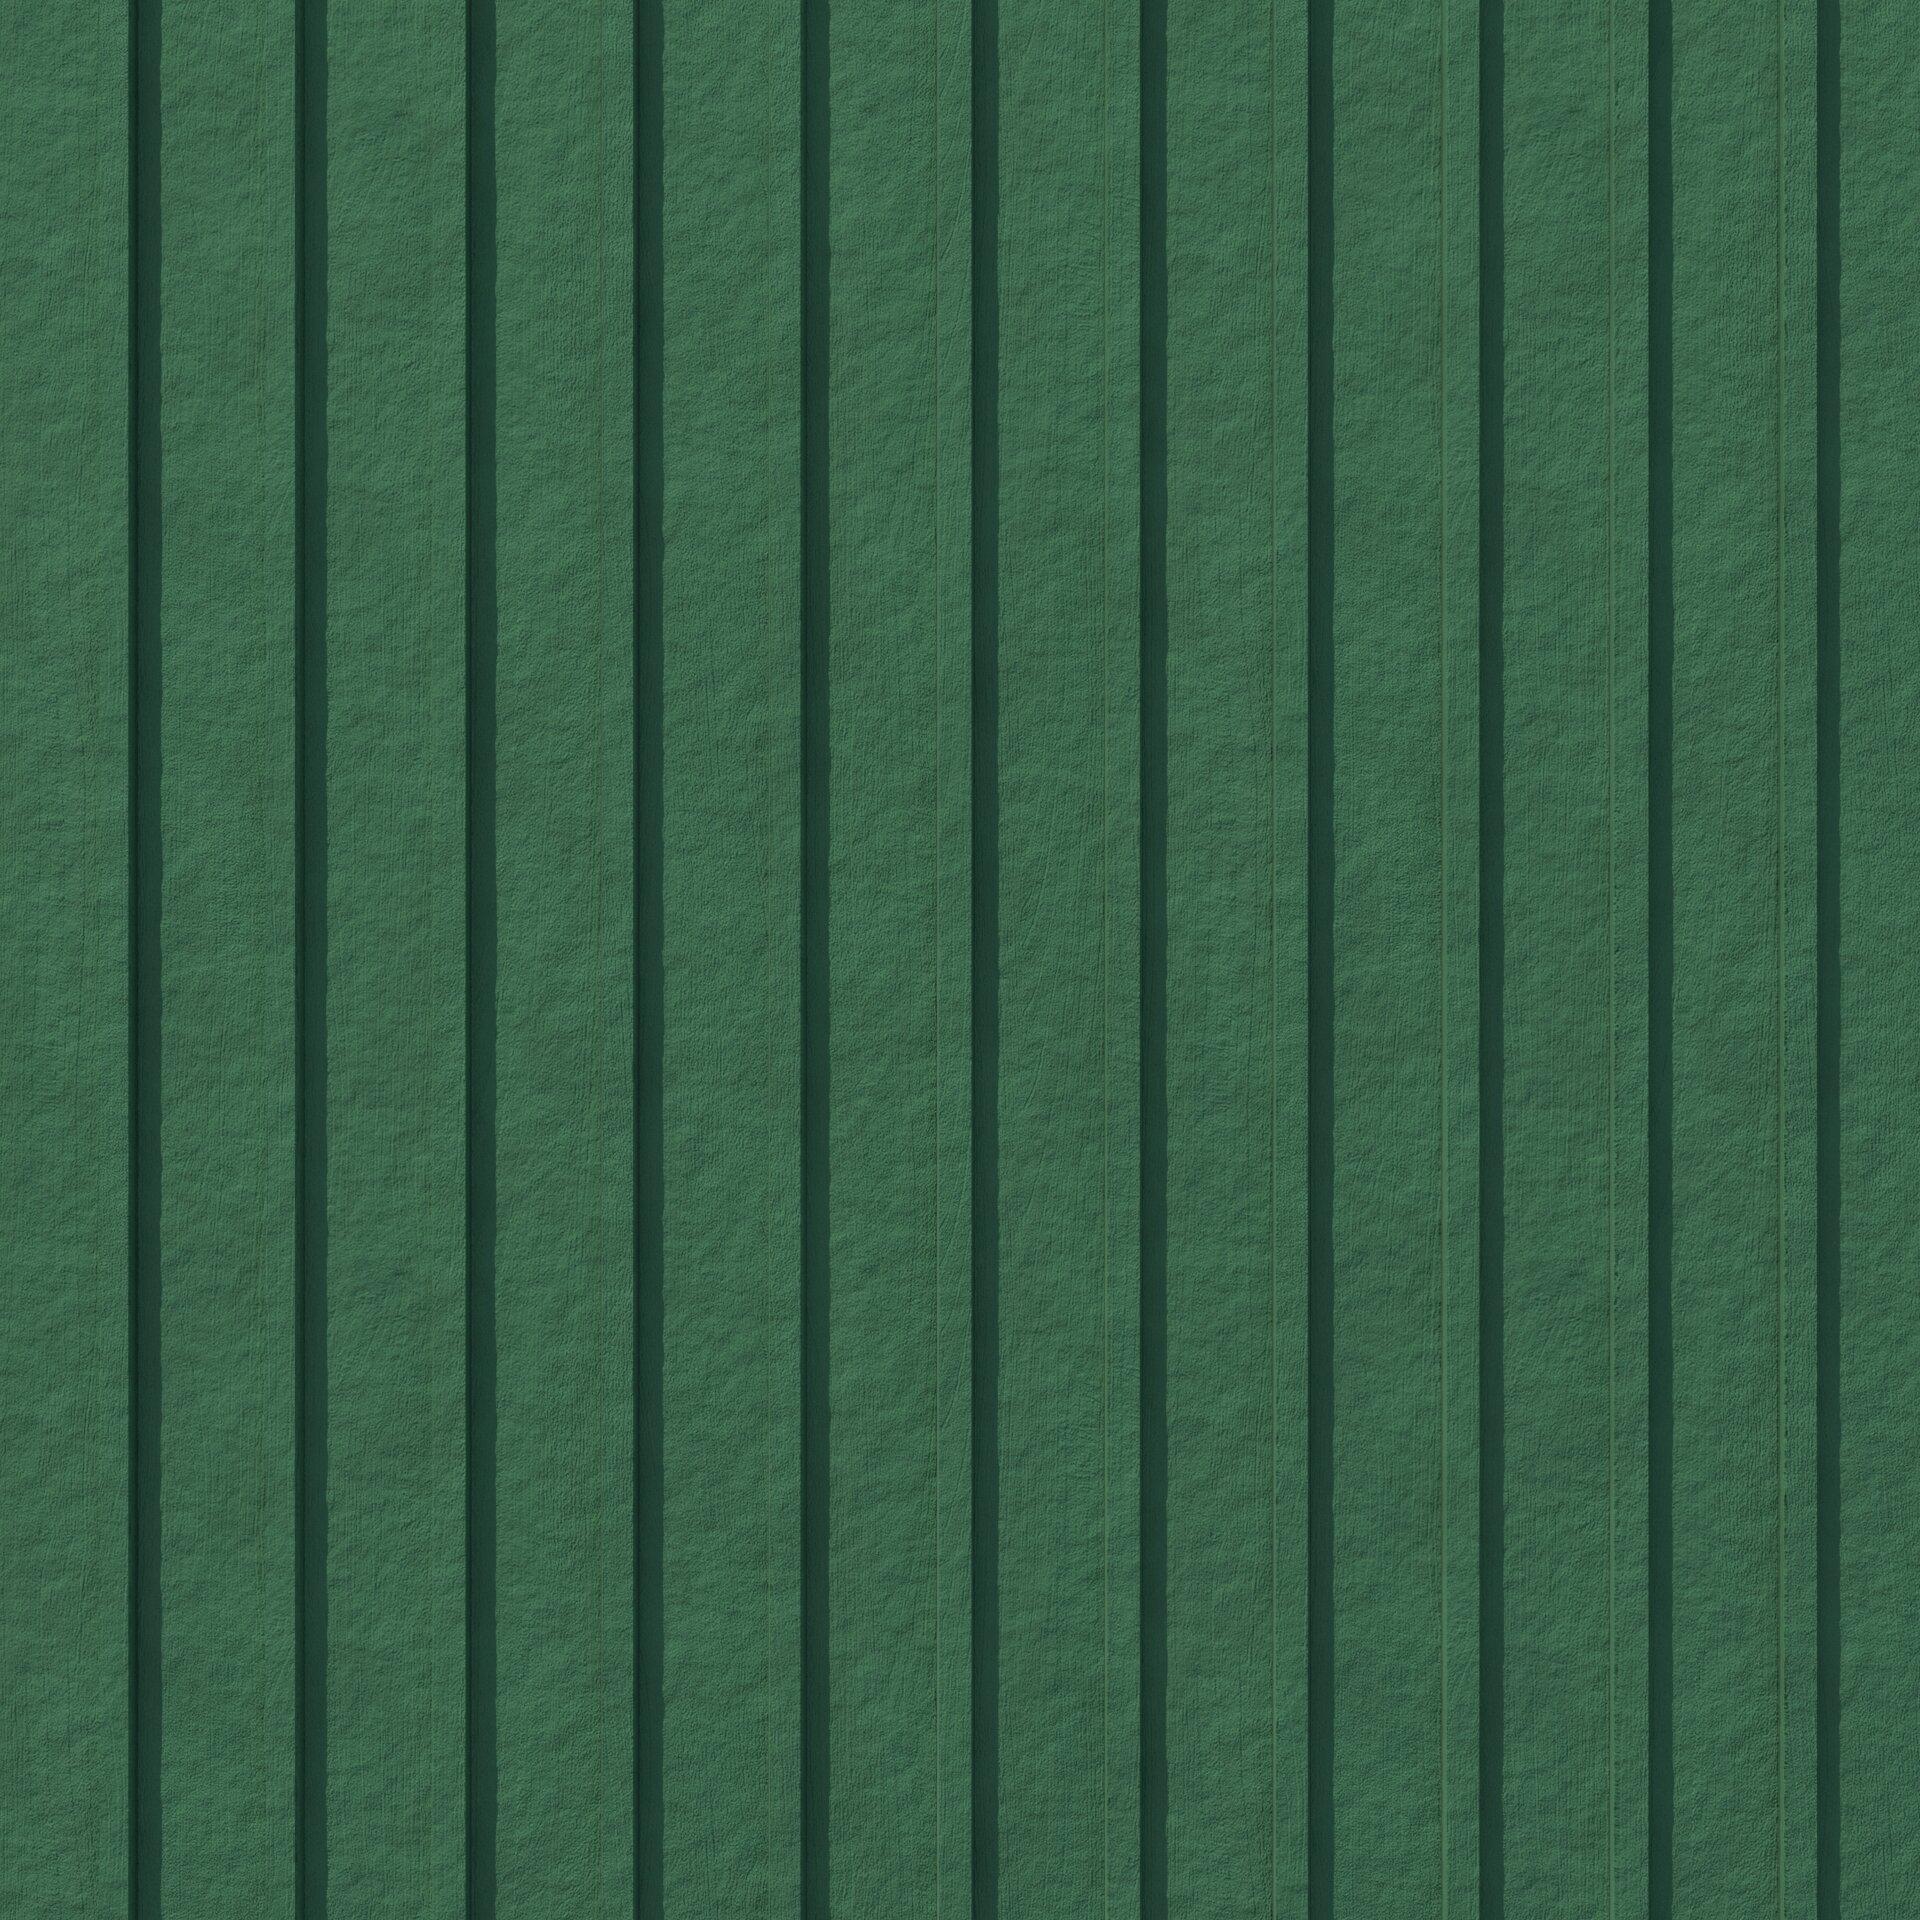 Siding AI 01B Green Preview.jpg